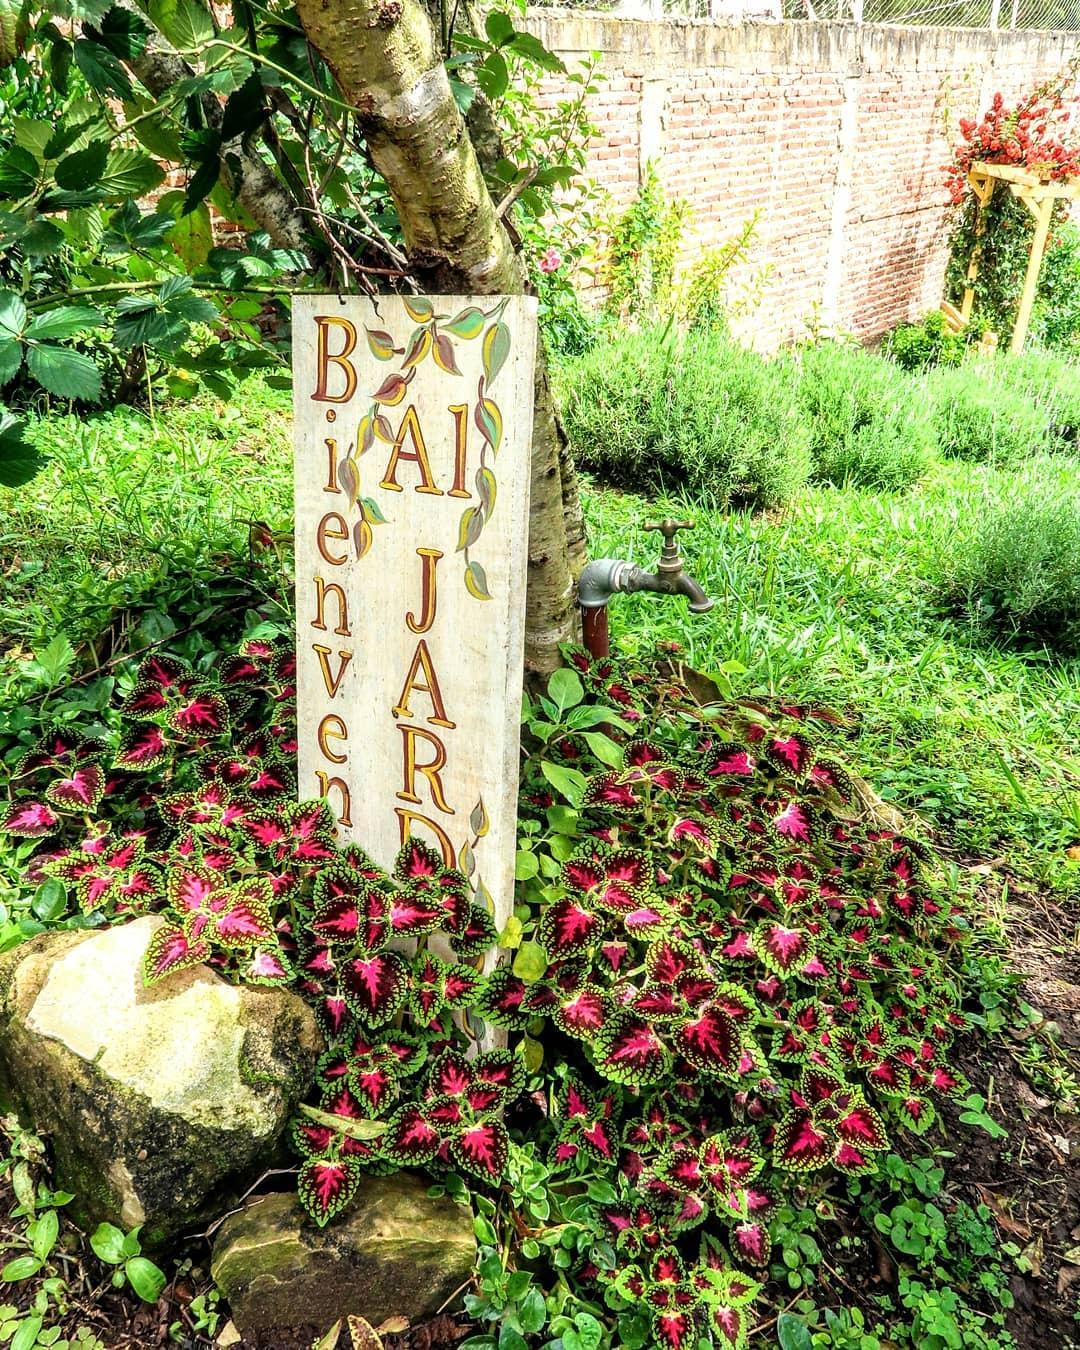 Bem-vindo ao nosso jardim! Bem-vindo ao nosso jardim! Crédito @nereidsrealm   ...